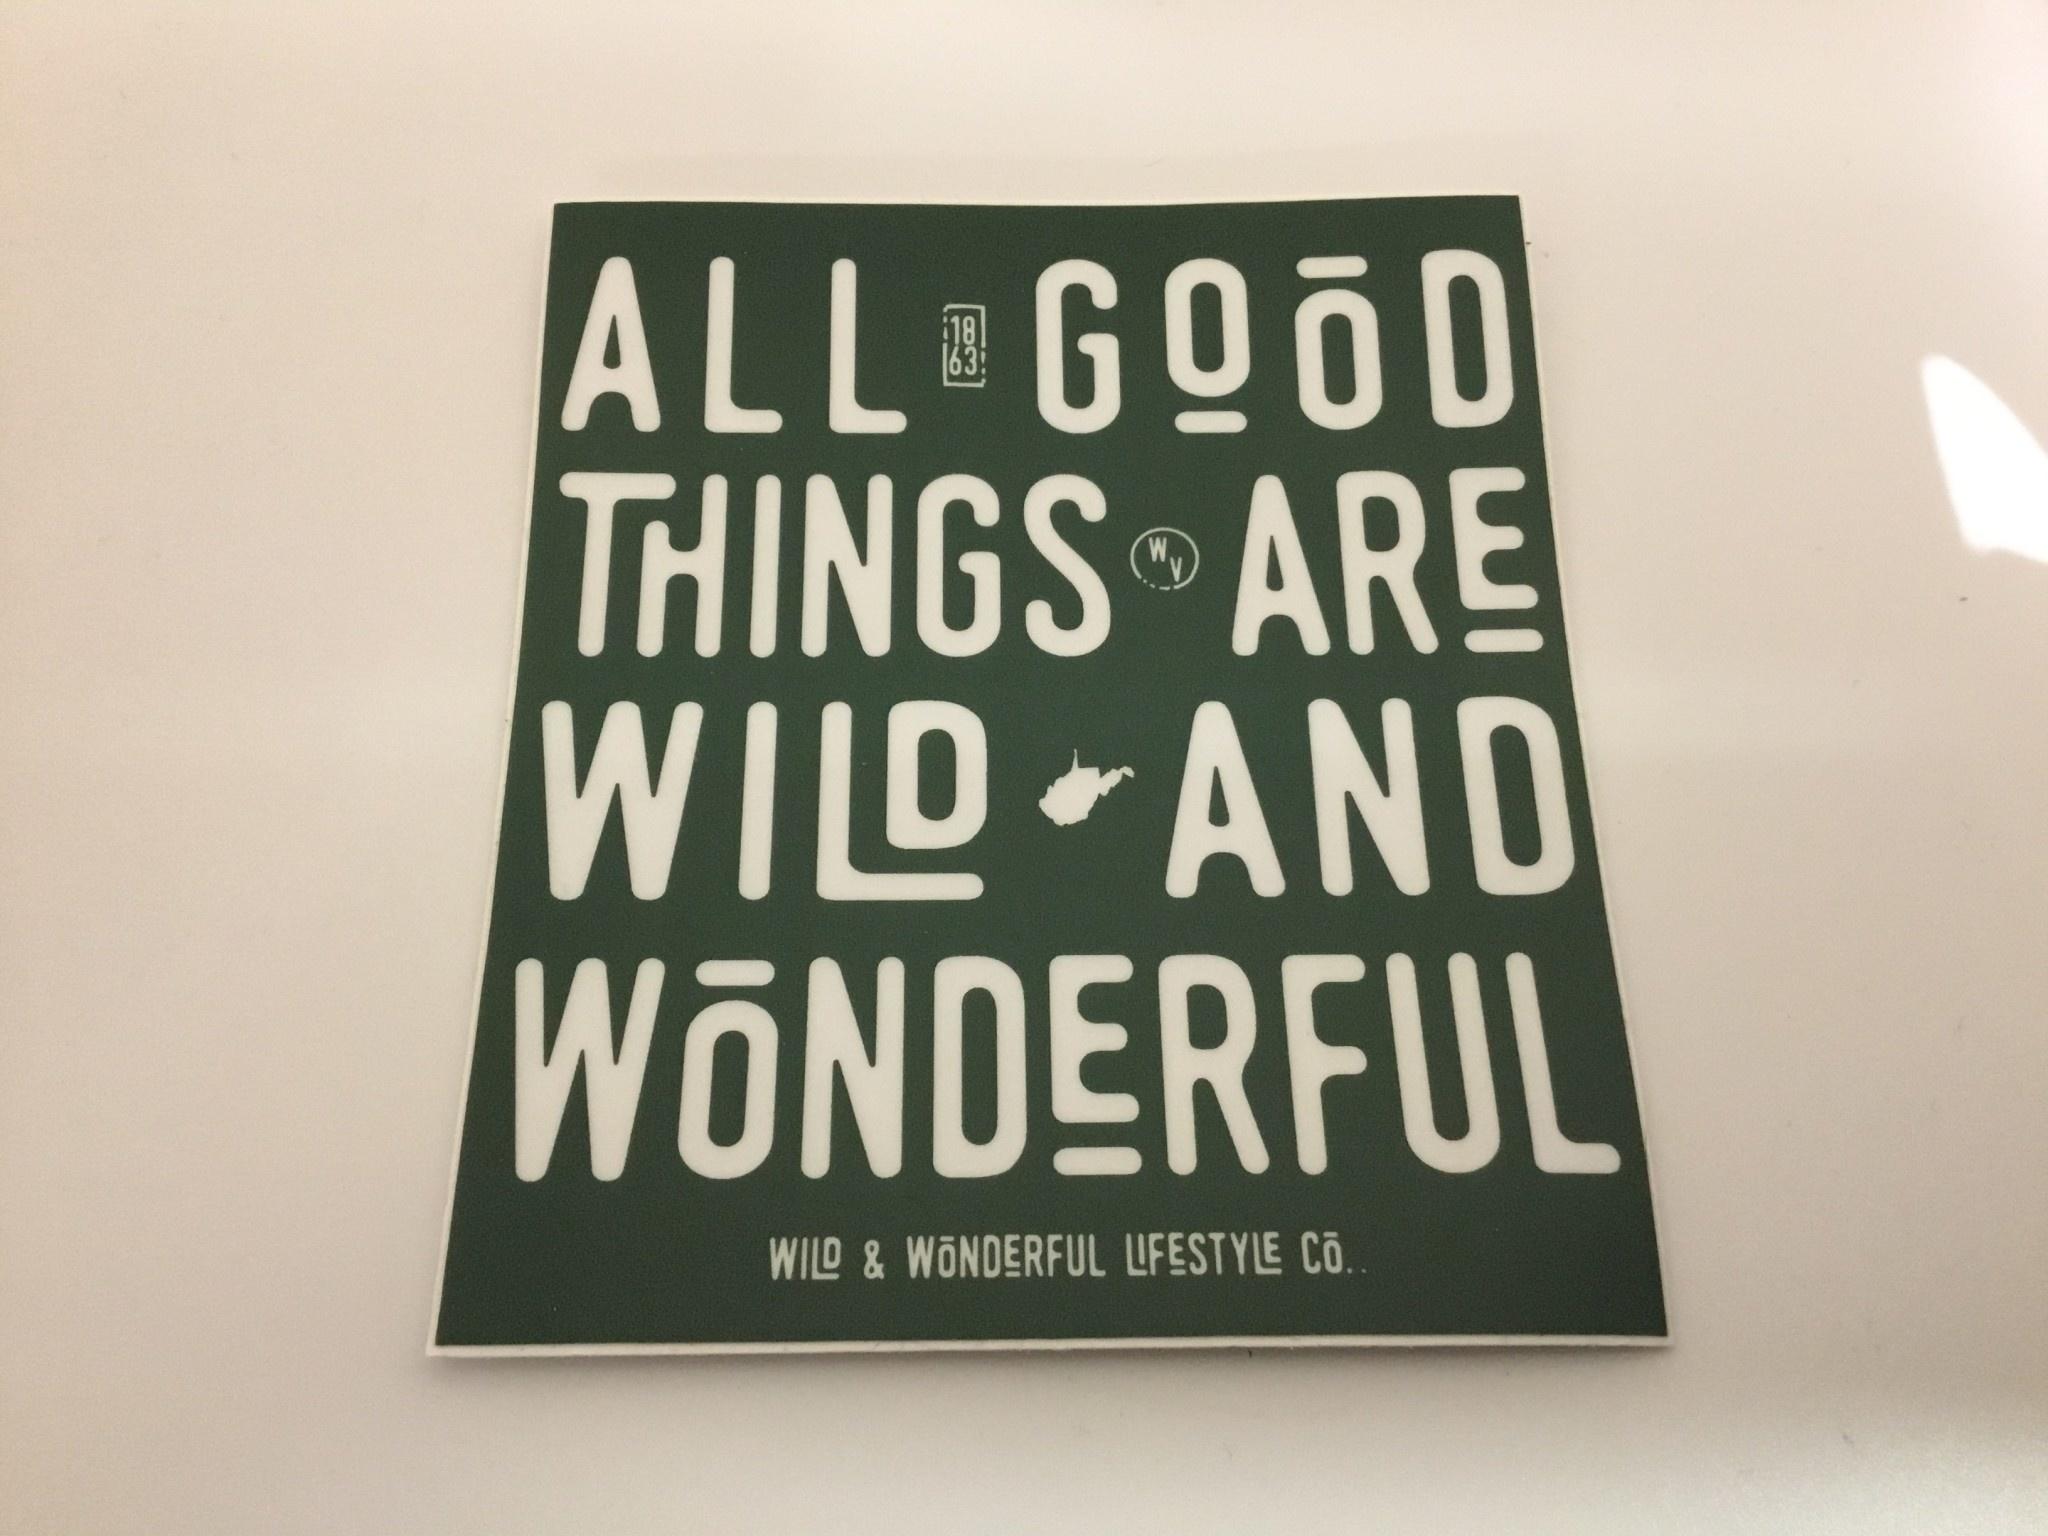 Wild & Wonderful Lifestyle Company Good Things Sticker